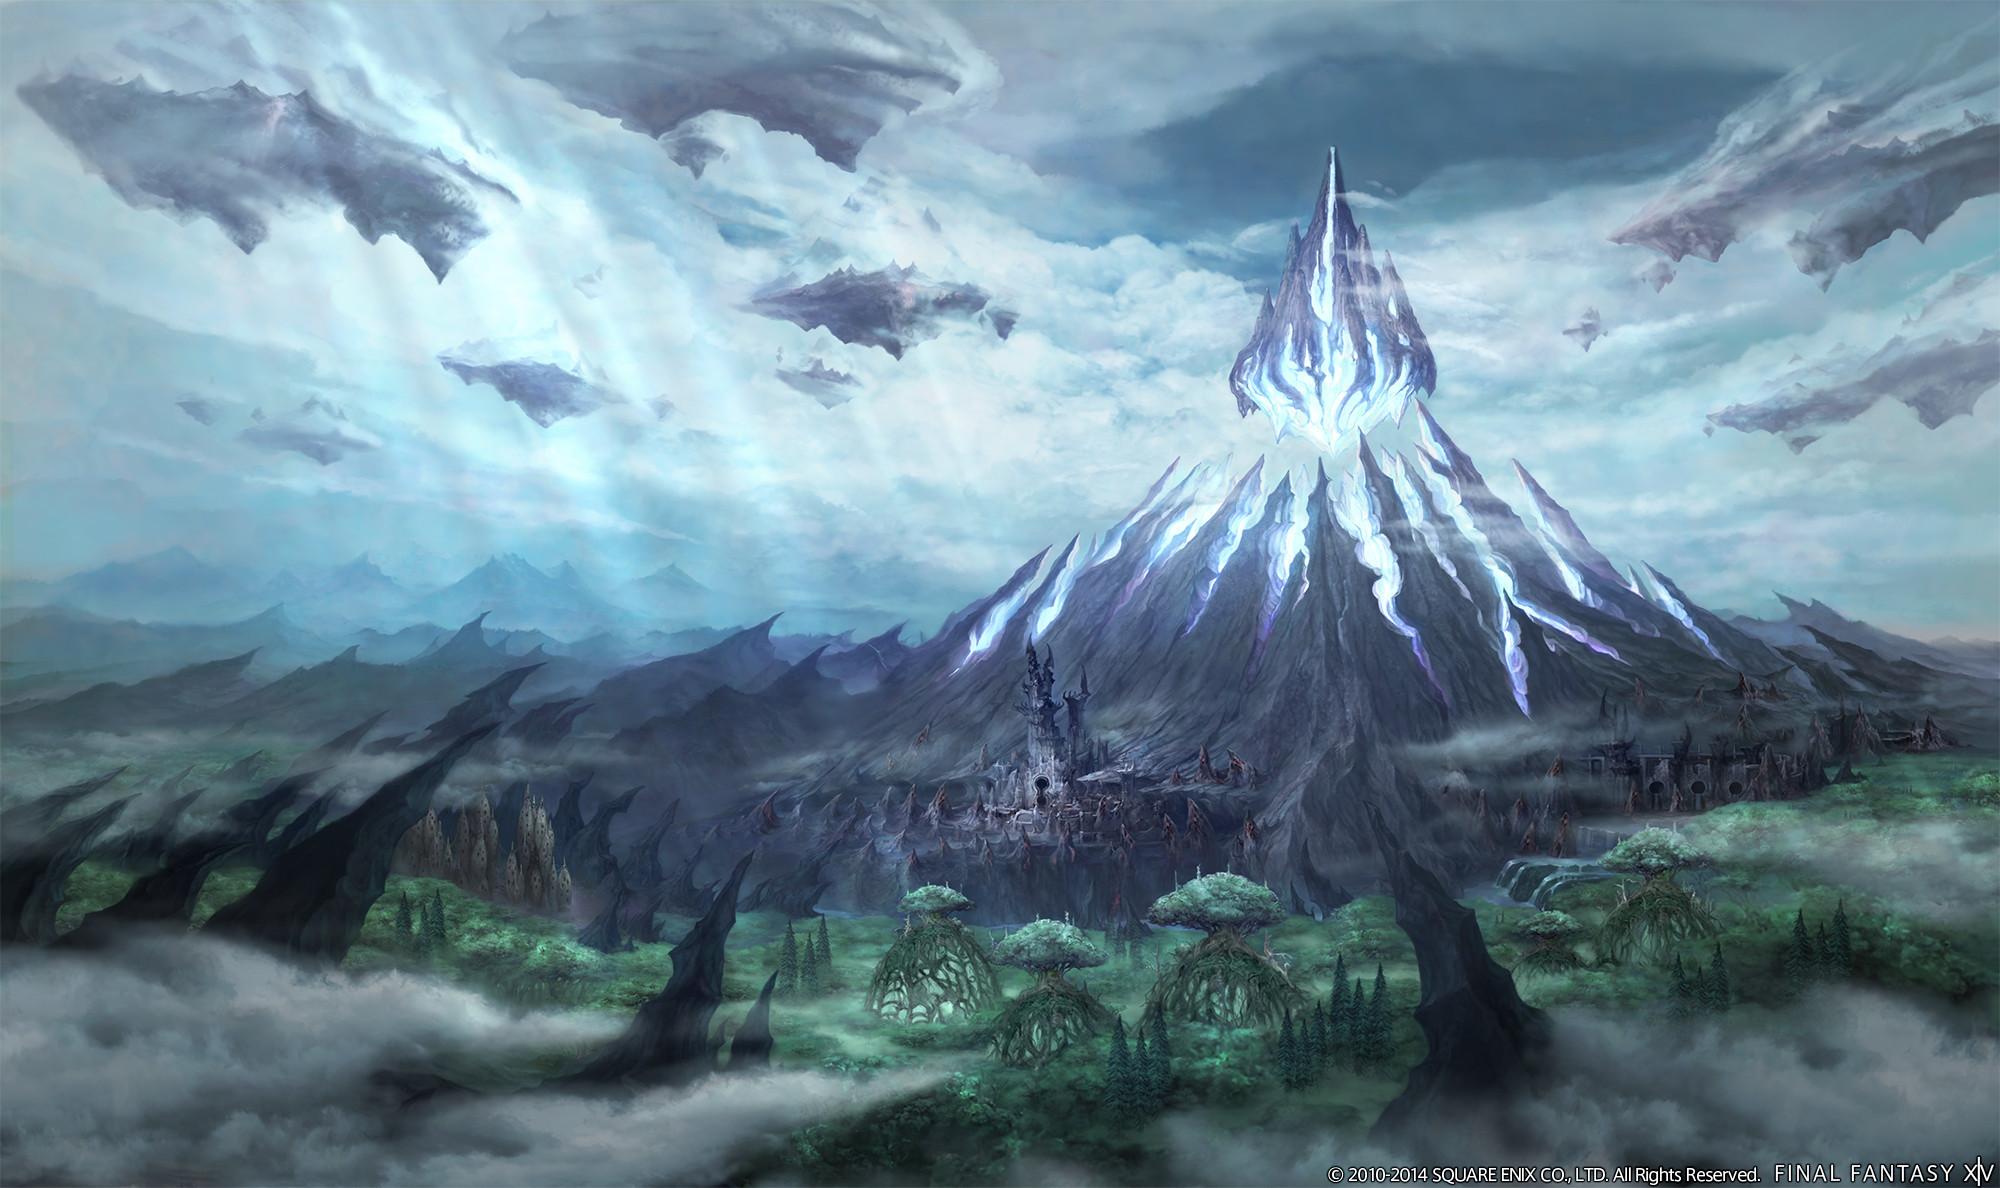 Final Fantasy XIV: Heavensward Environment Screens & Artworks